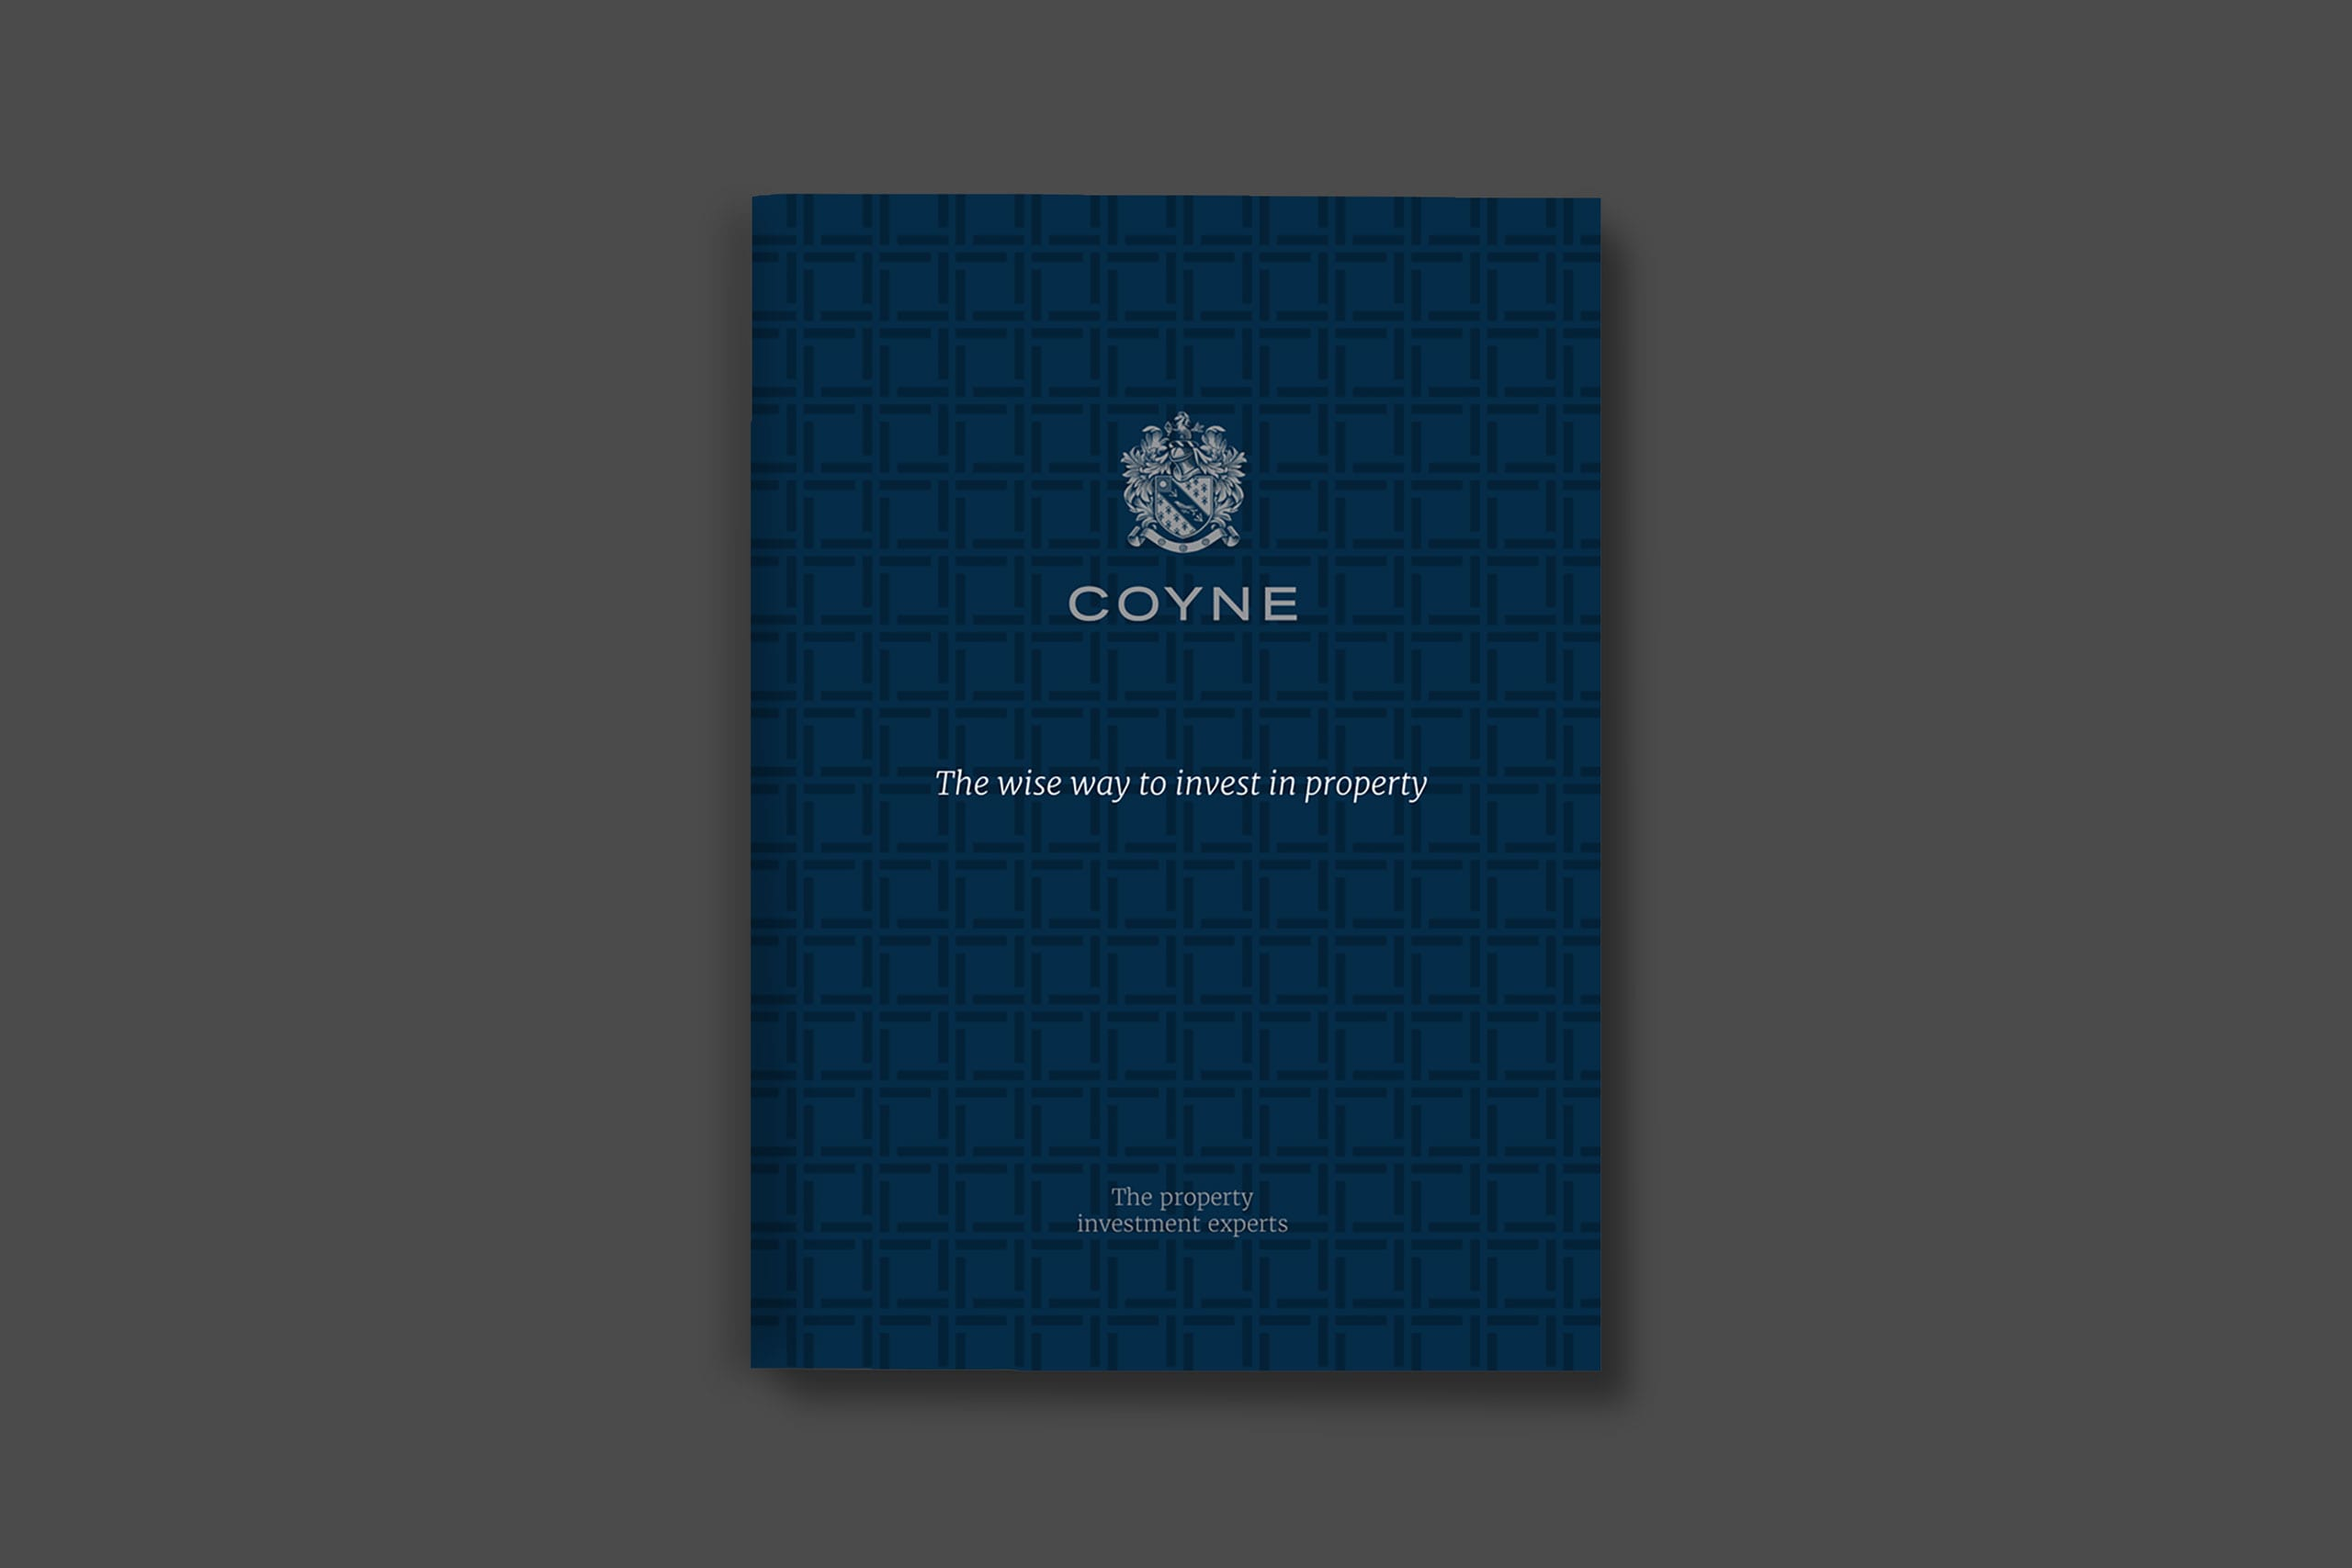 Coyne brochure cover